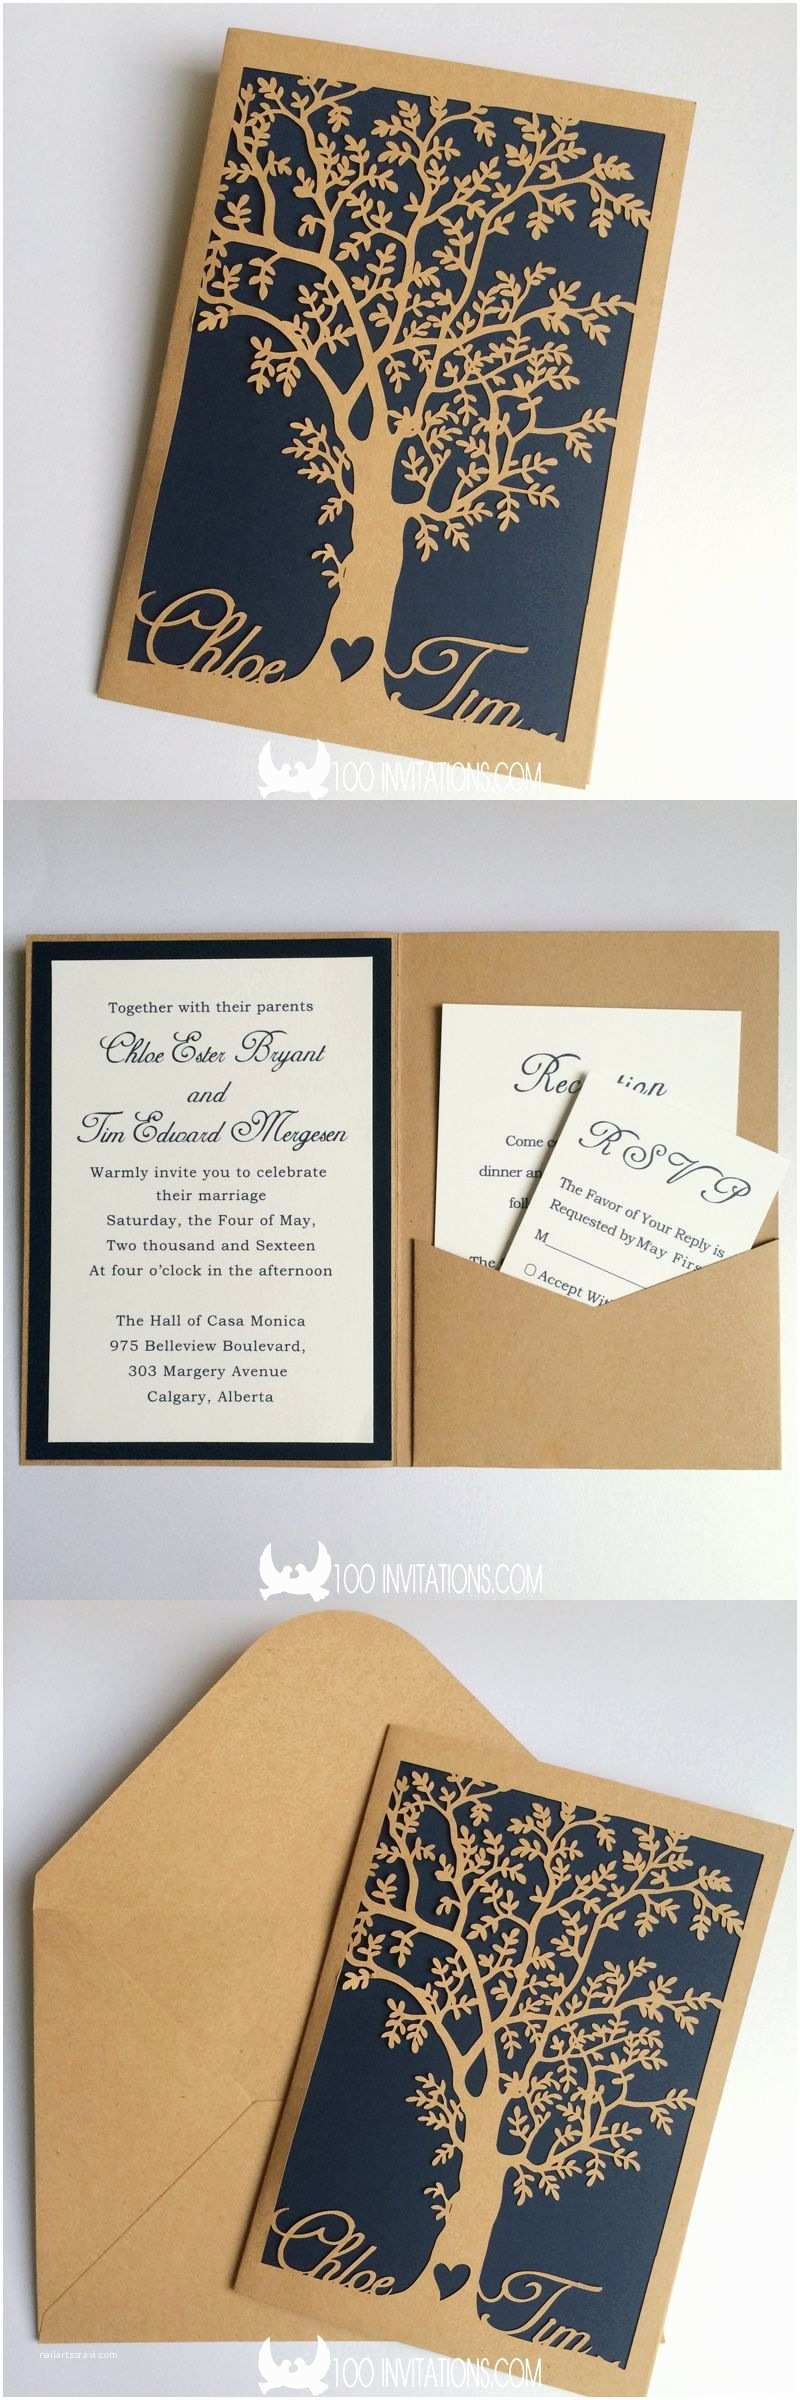 Laser Cut Pocket Wedding Invitations Custom Laser Cut Bride and Groom S Name Tree Pocket